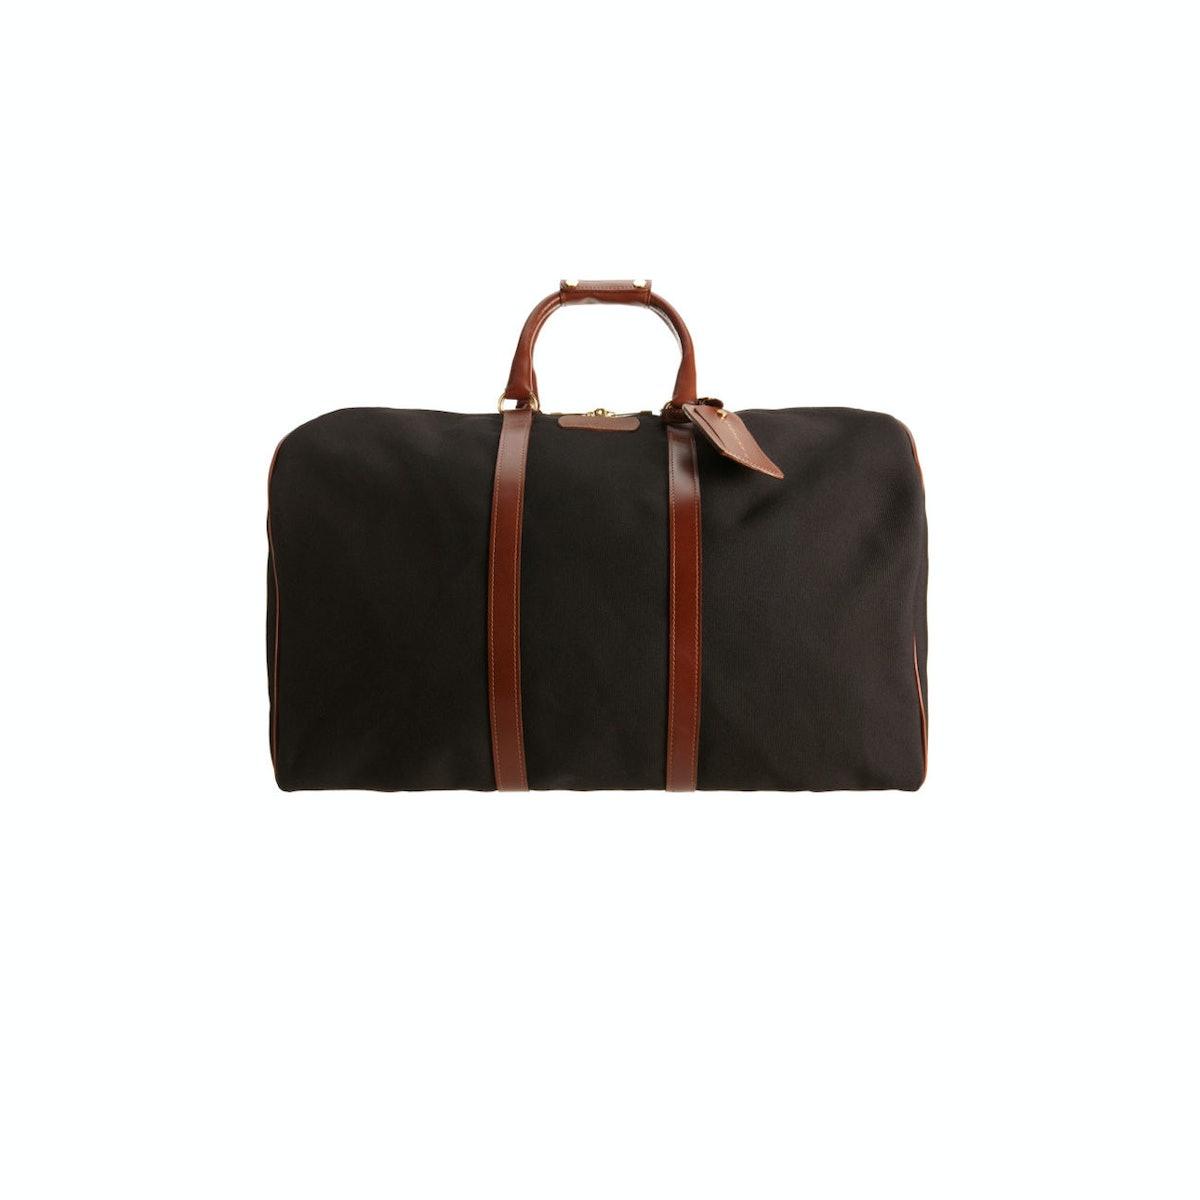 T Anthony bag